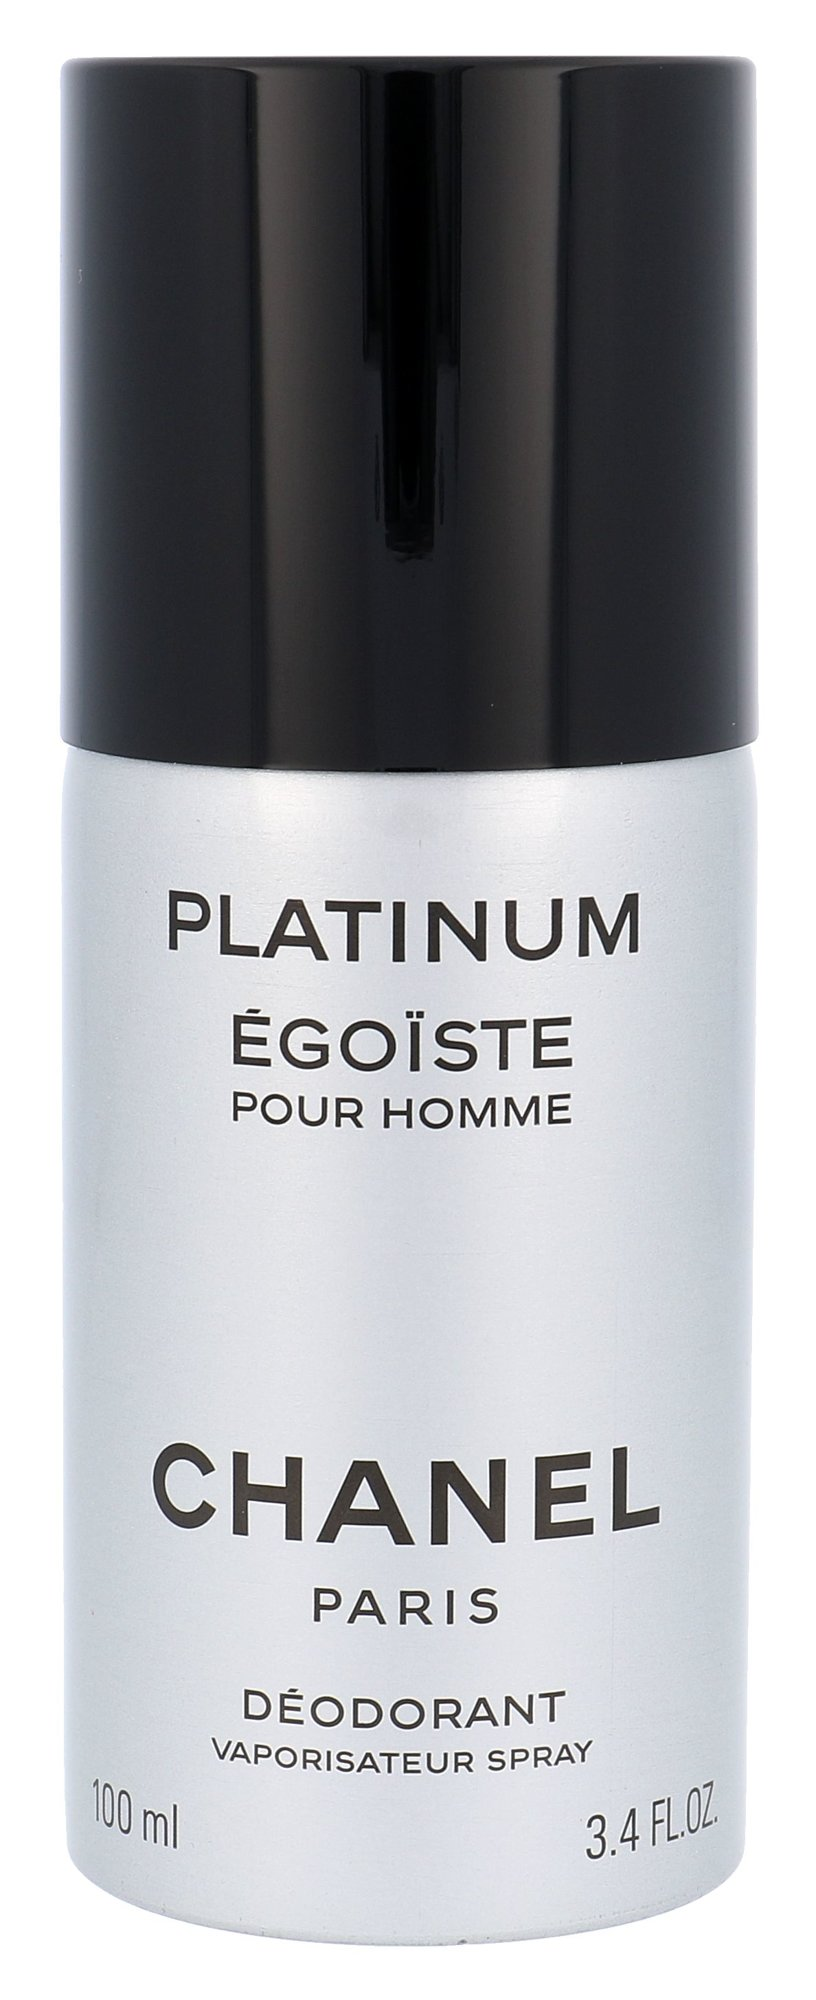 Chanel Platinum Egoiste Pour Homme Deodorant 100ml